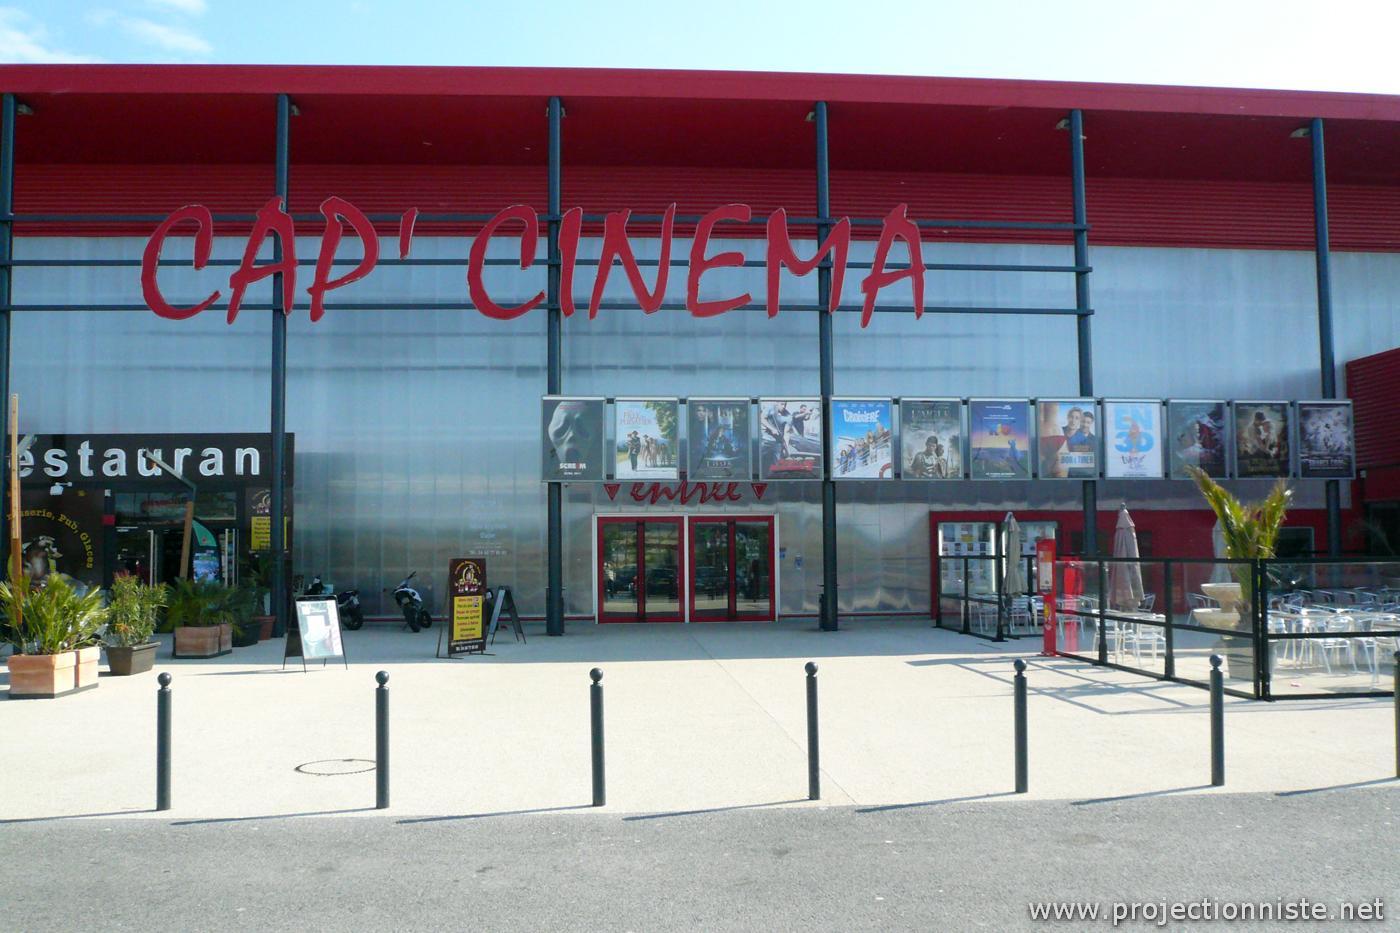 cinema cap cinema carcassonne